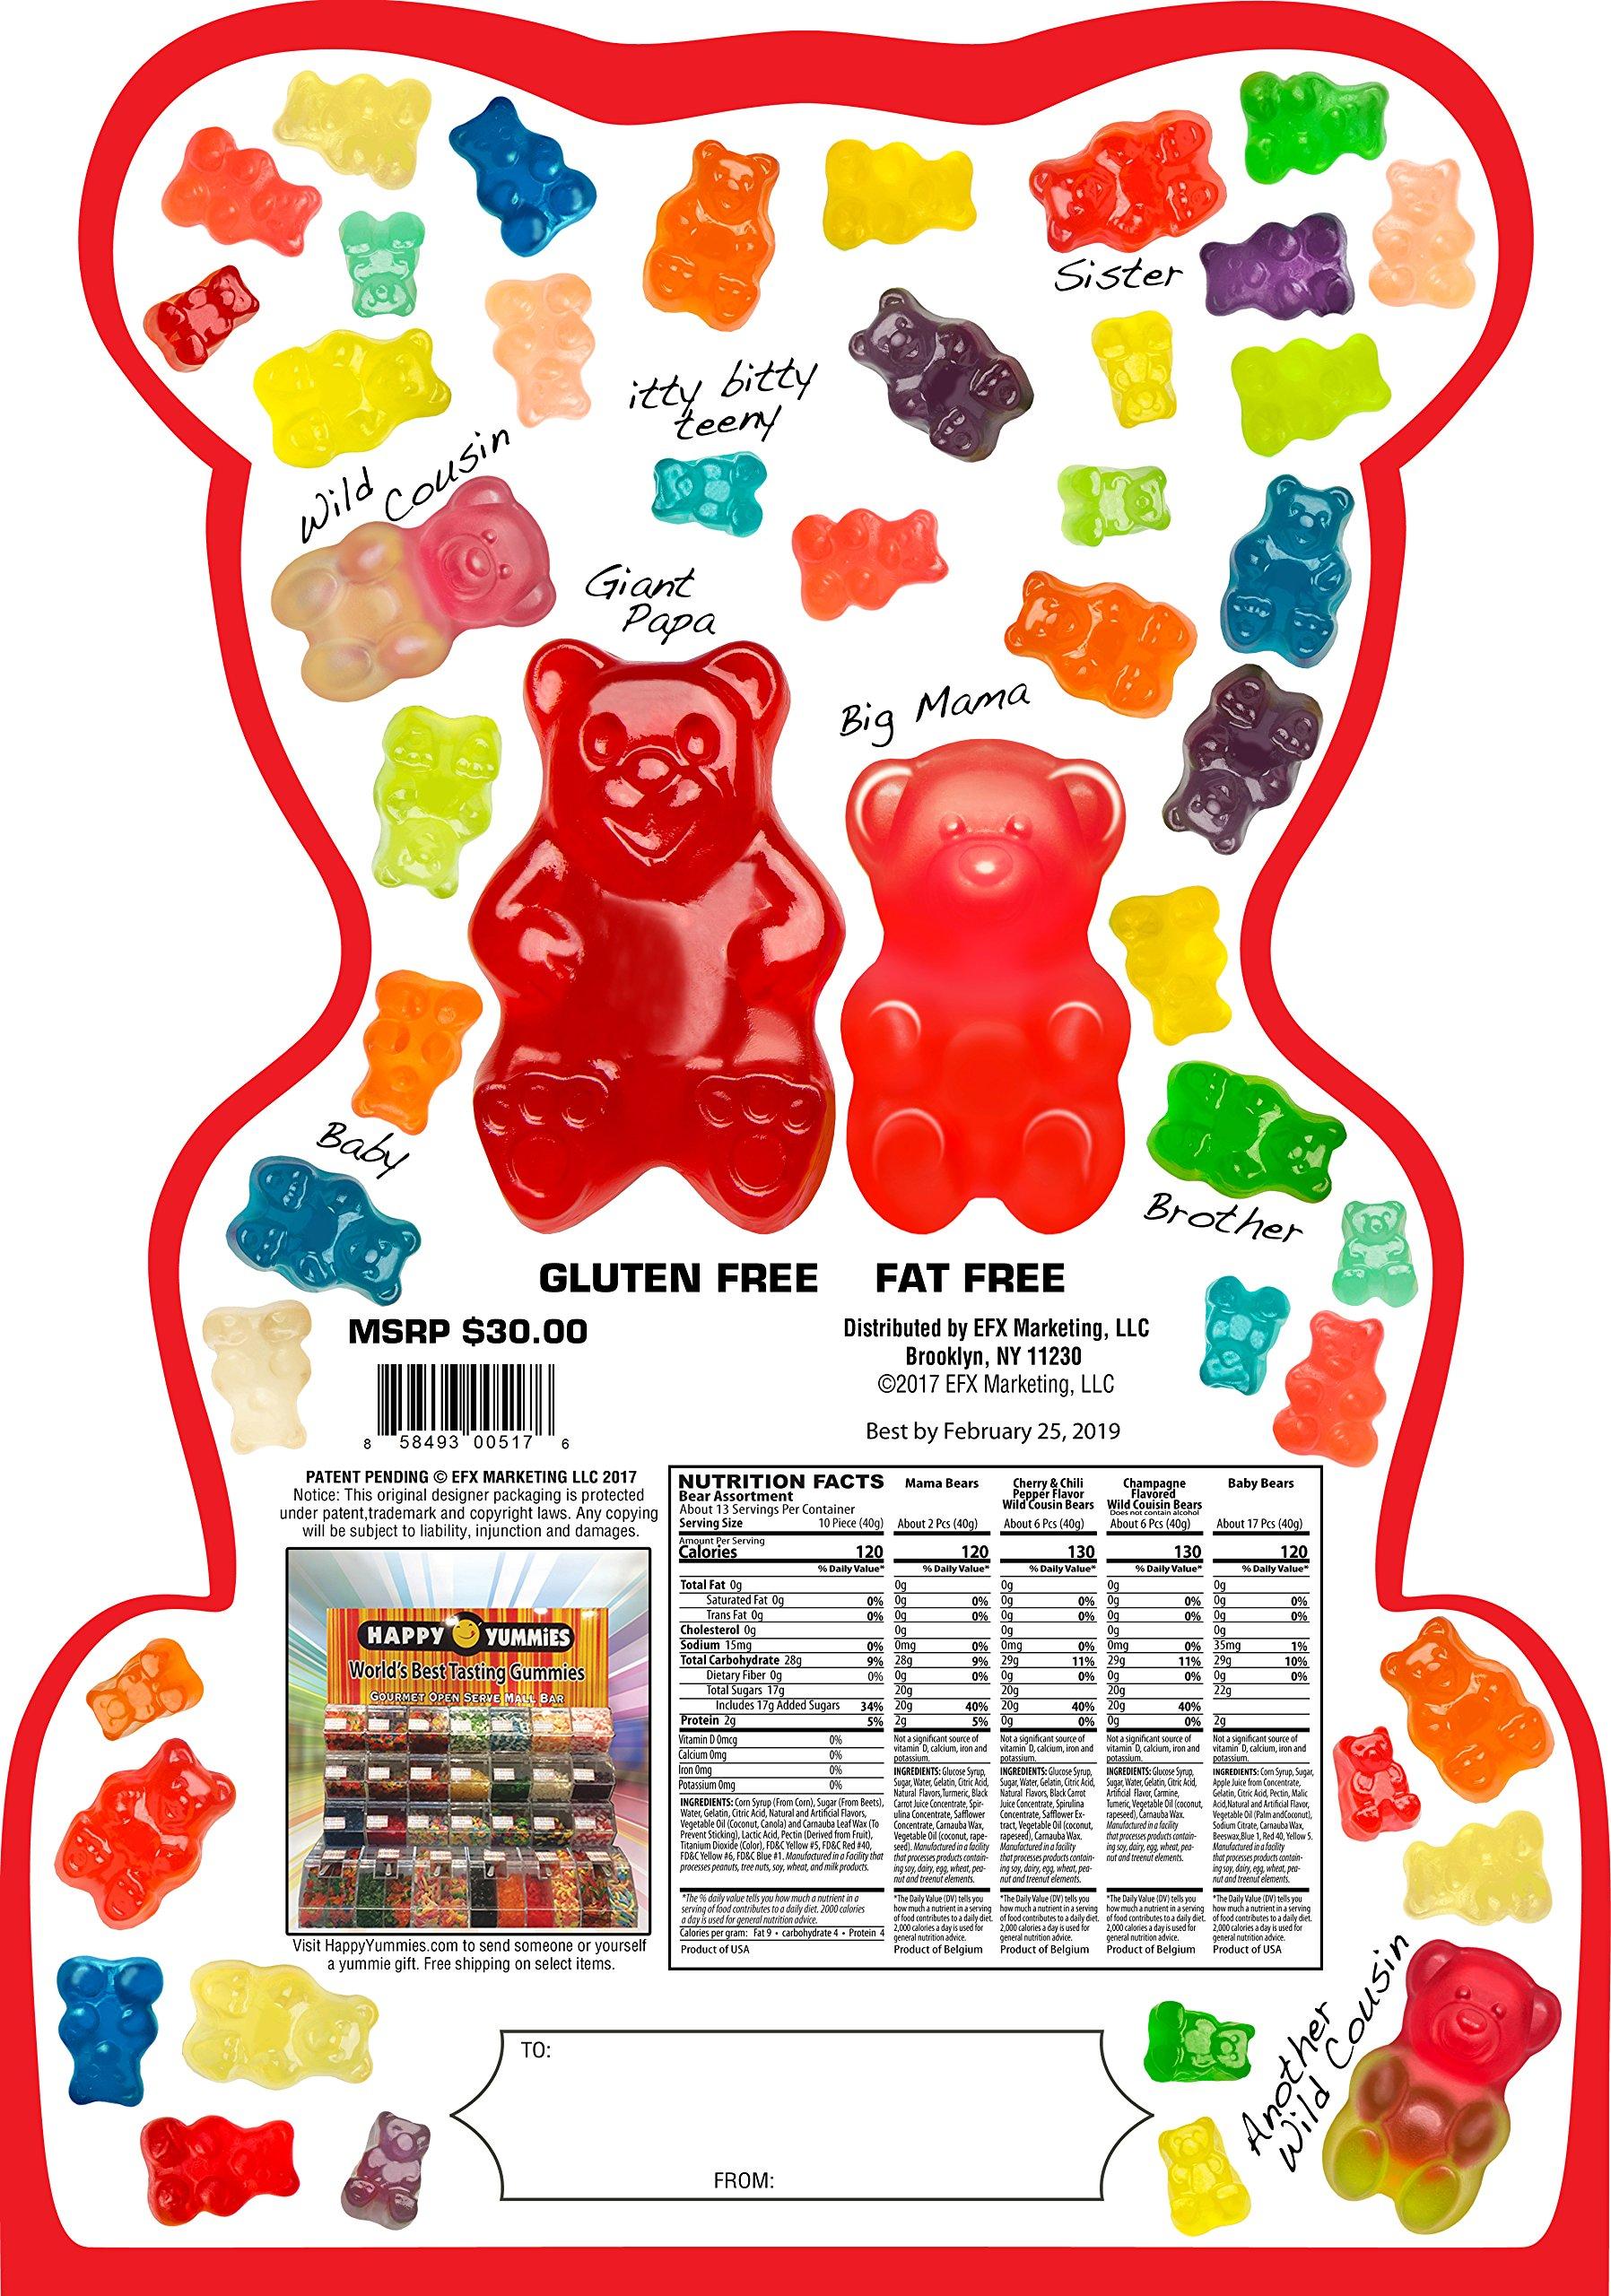 Happy Yummies Worlds Best Tasting Gourmet Gummies Super Bear Assortment 4lb. (64 ounces) by Happy Yummies